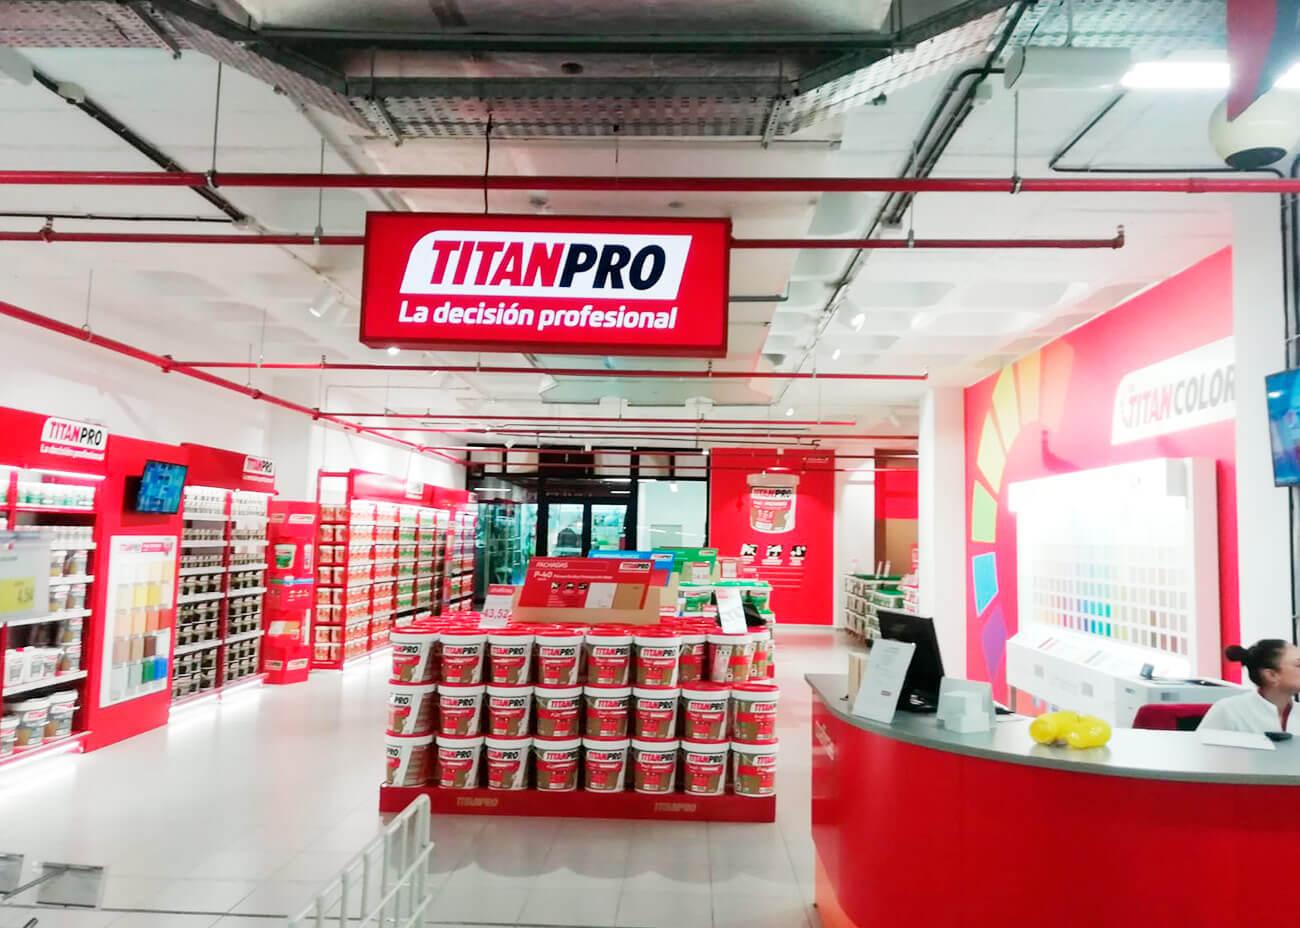 titanpro-img01-caad-retail-design-barcelona